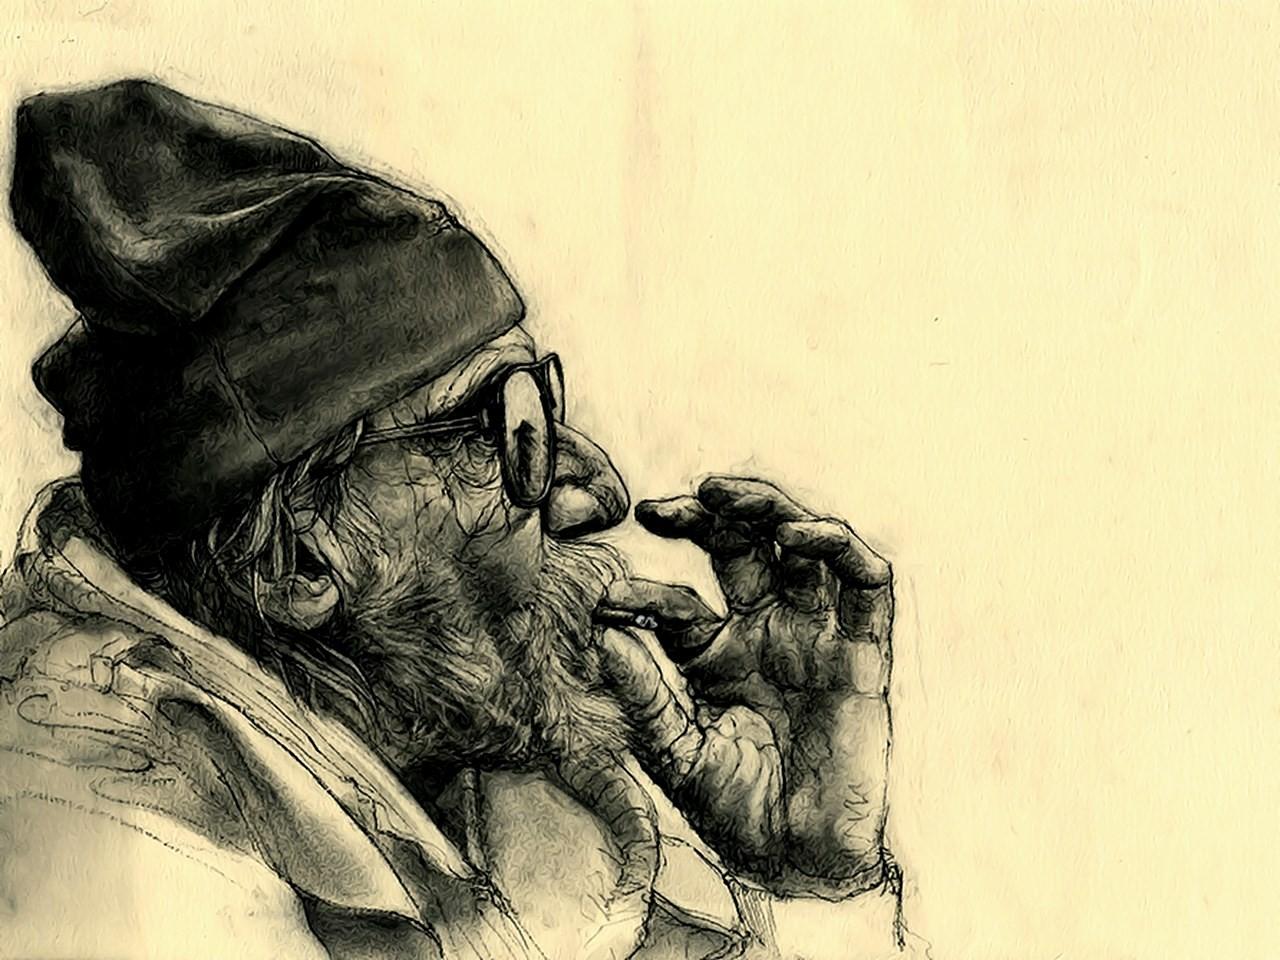 Wallpaper Gambar Ilustrasi Potret Merokok Orang Tua Ganja